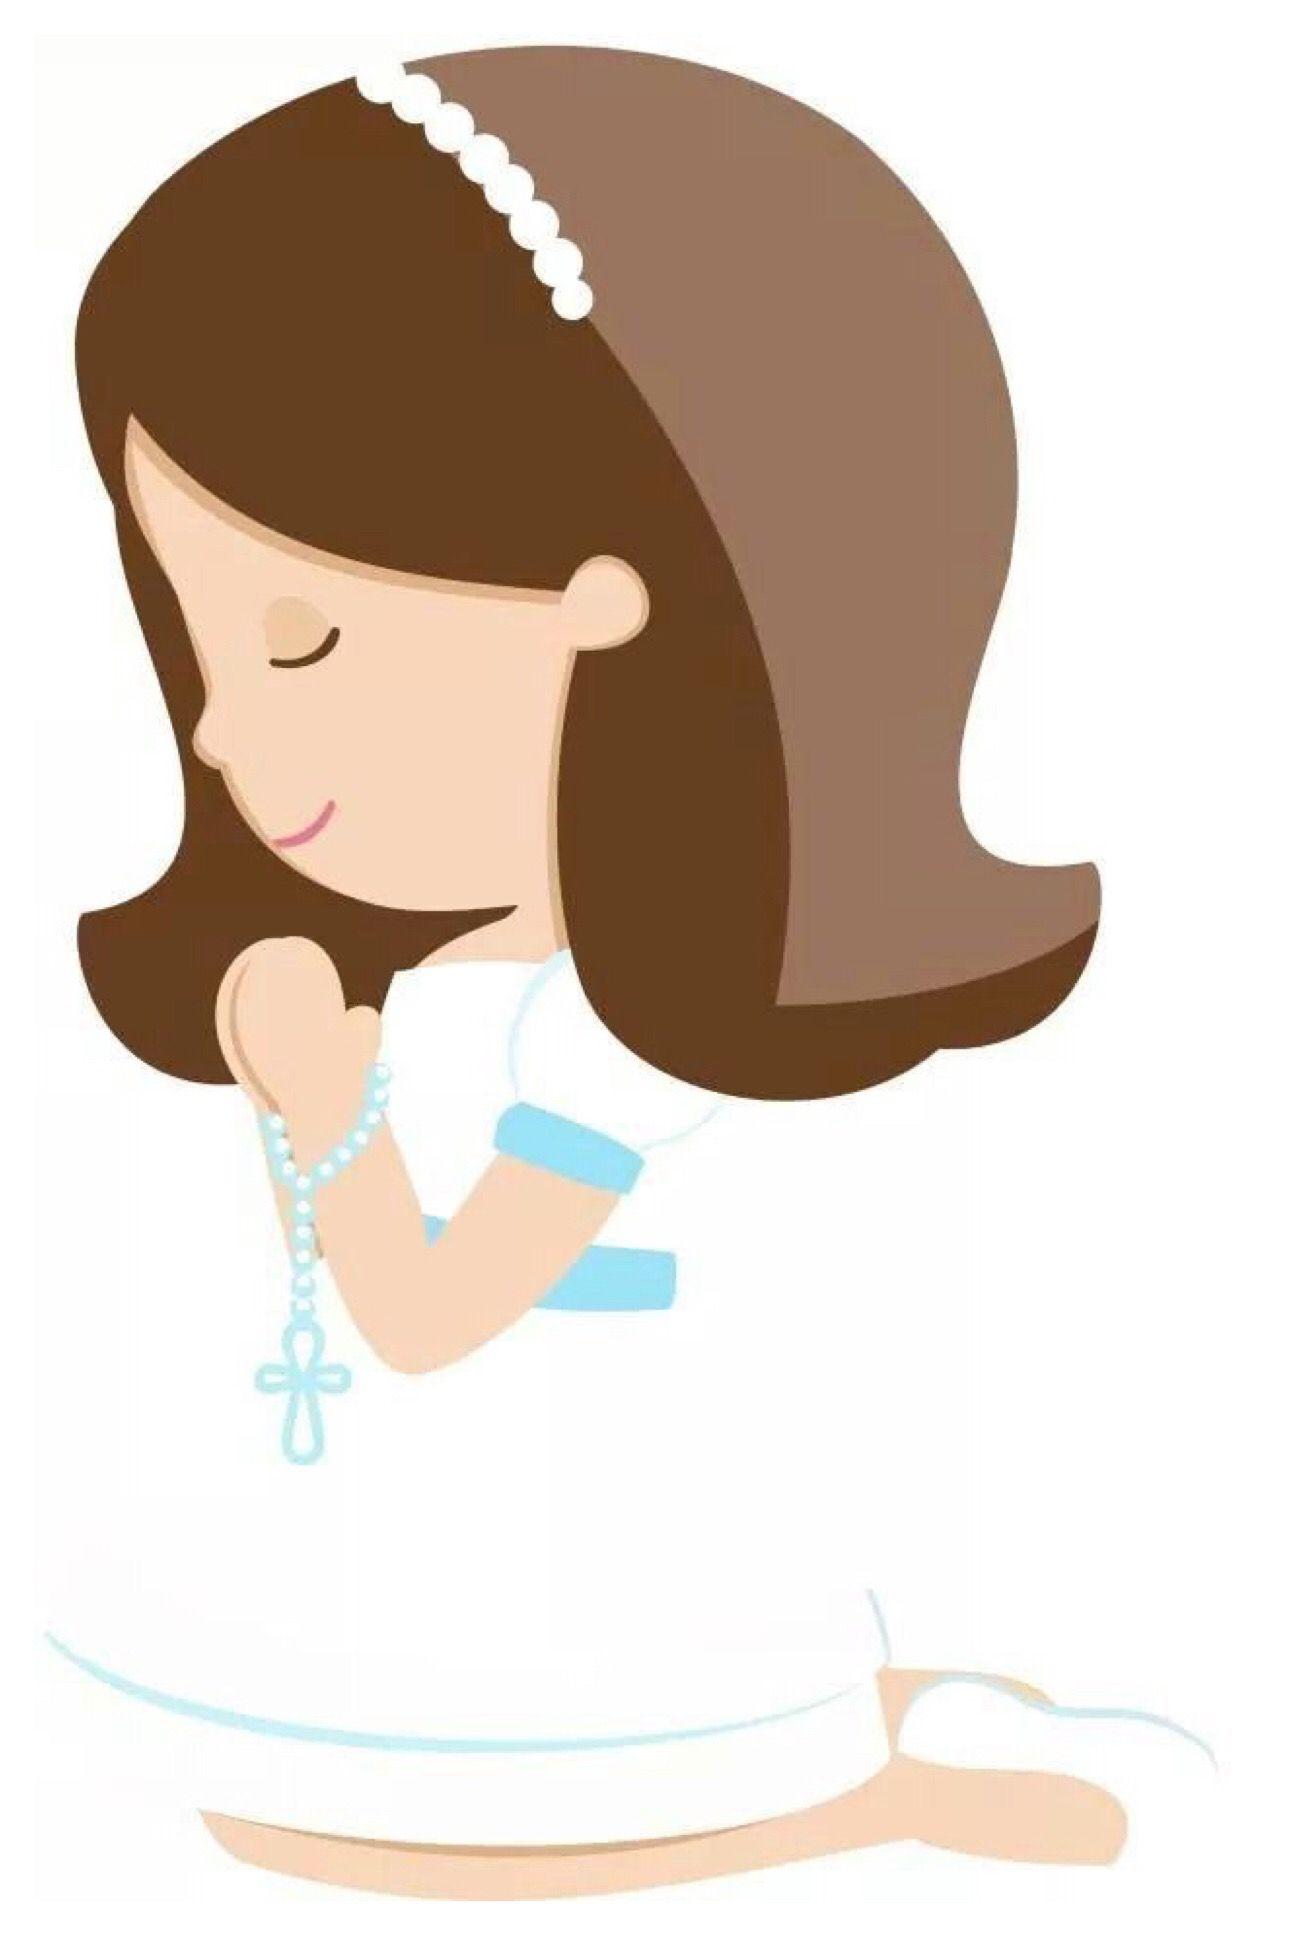 Mi primera comunion transparent clipart nino blanco royalty free Pin de Erika Cano en DIY Crafts | Primera comunion png ... royalty free